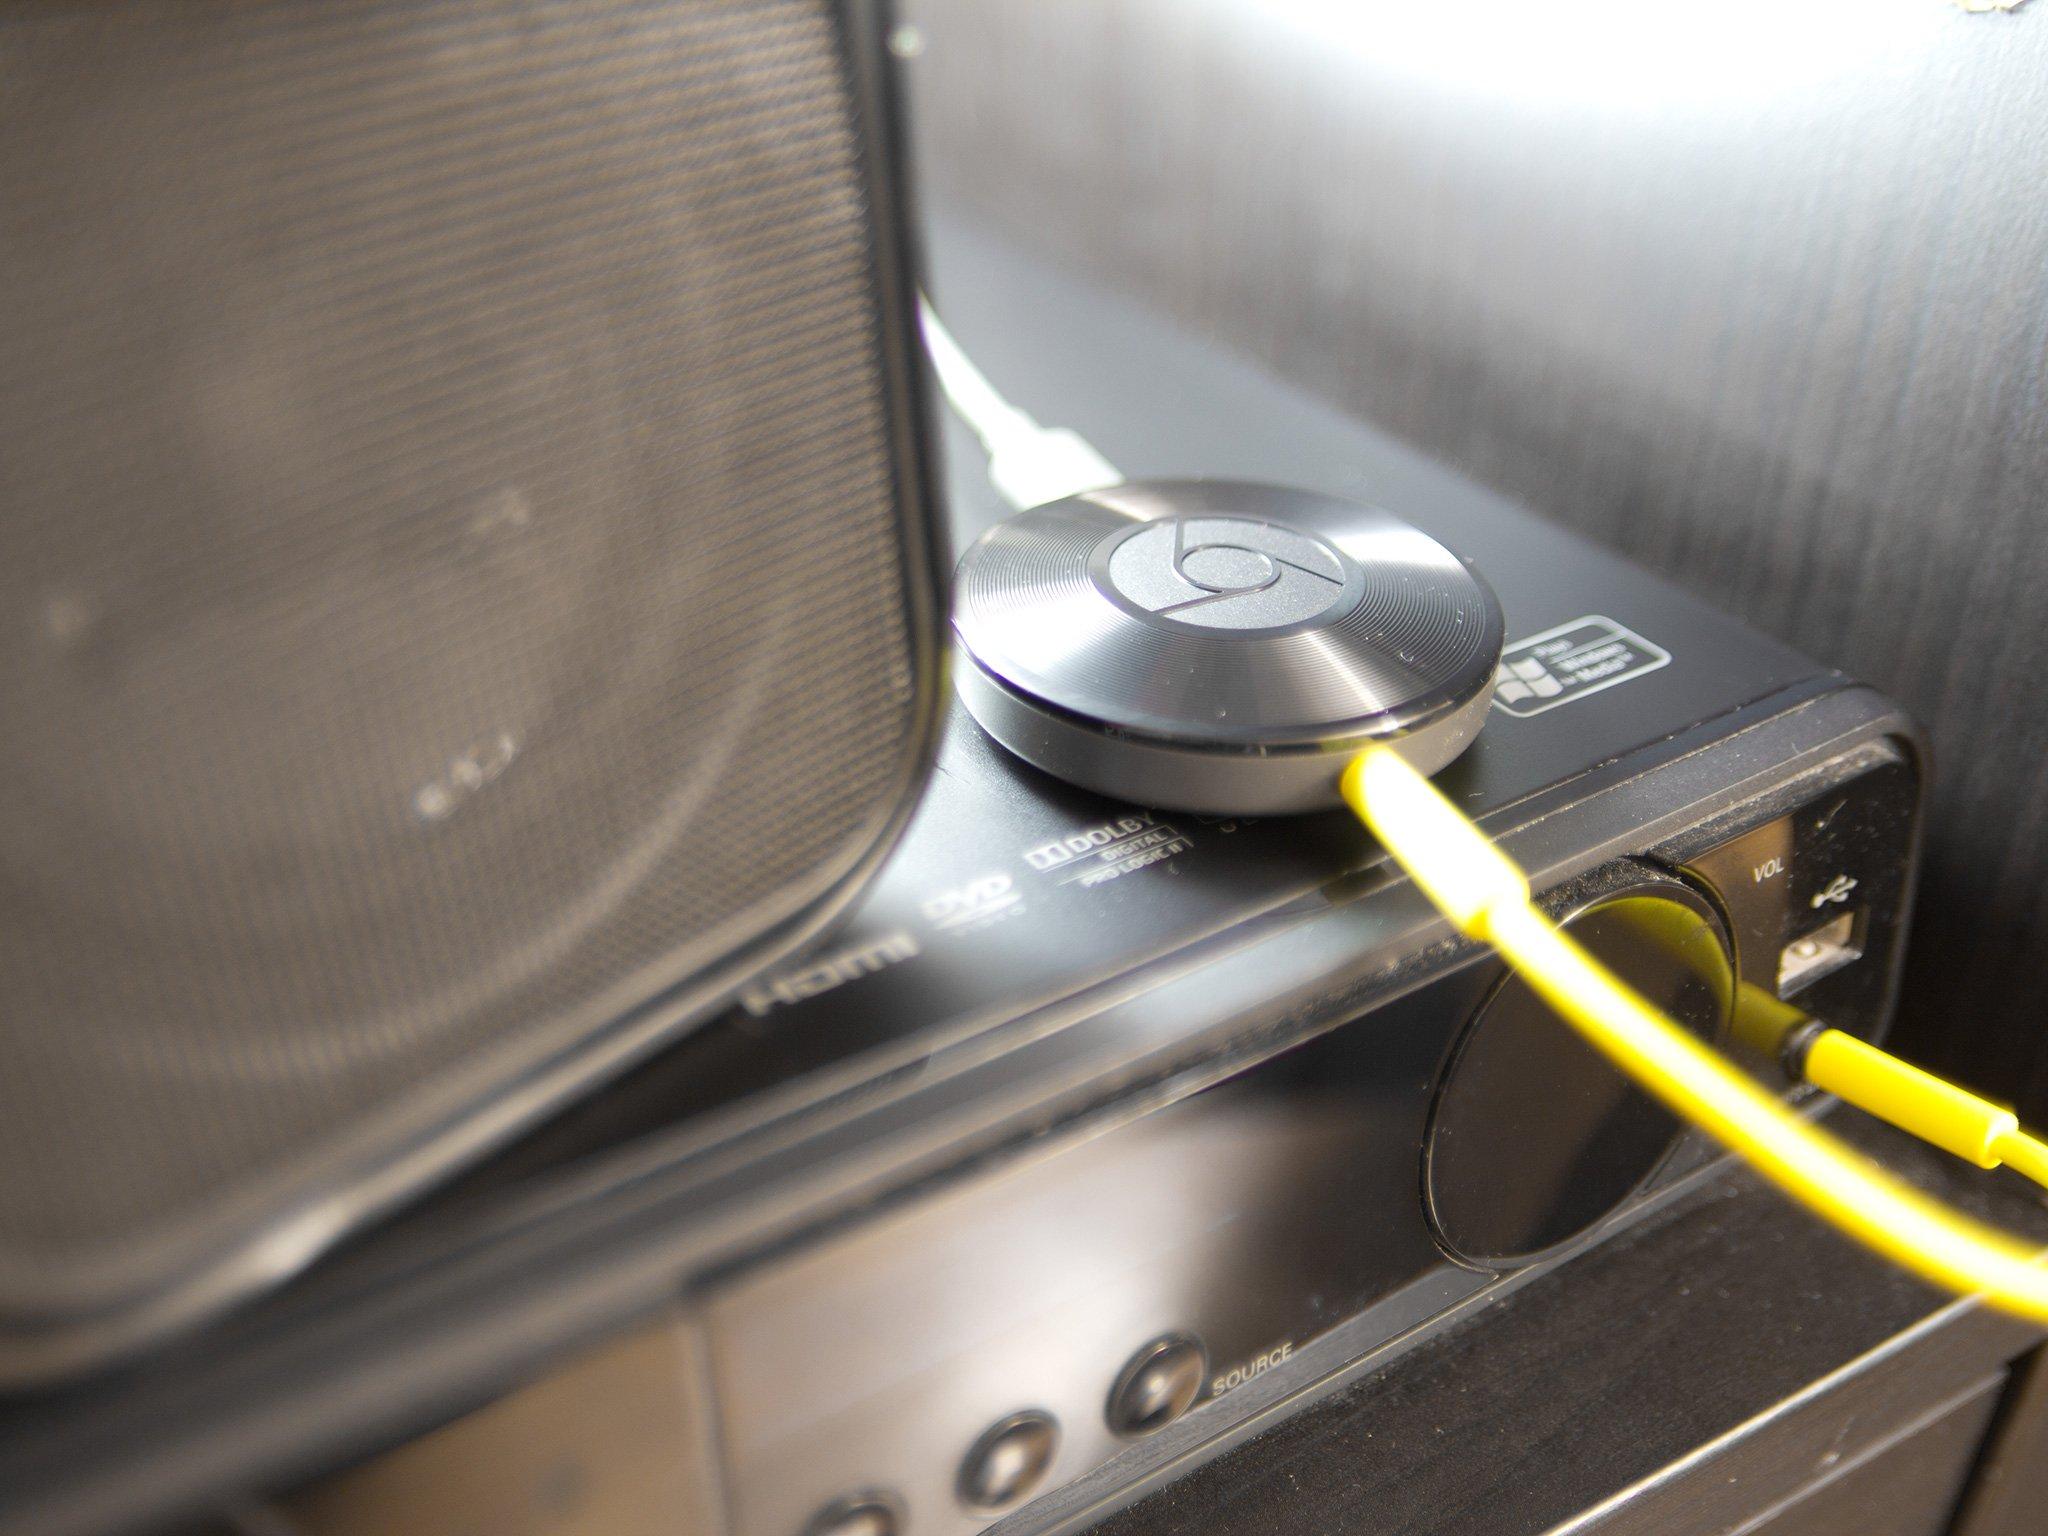 medium resolution of chromecast audio system